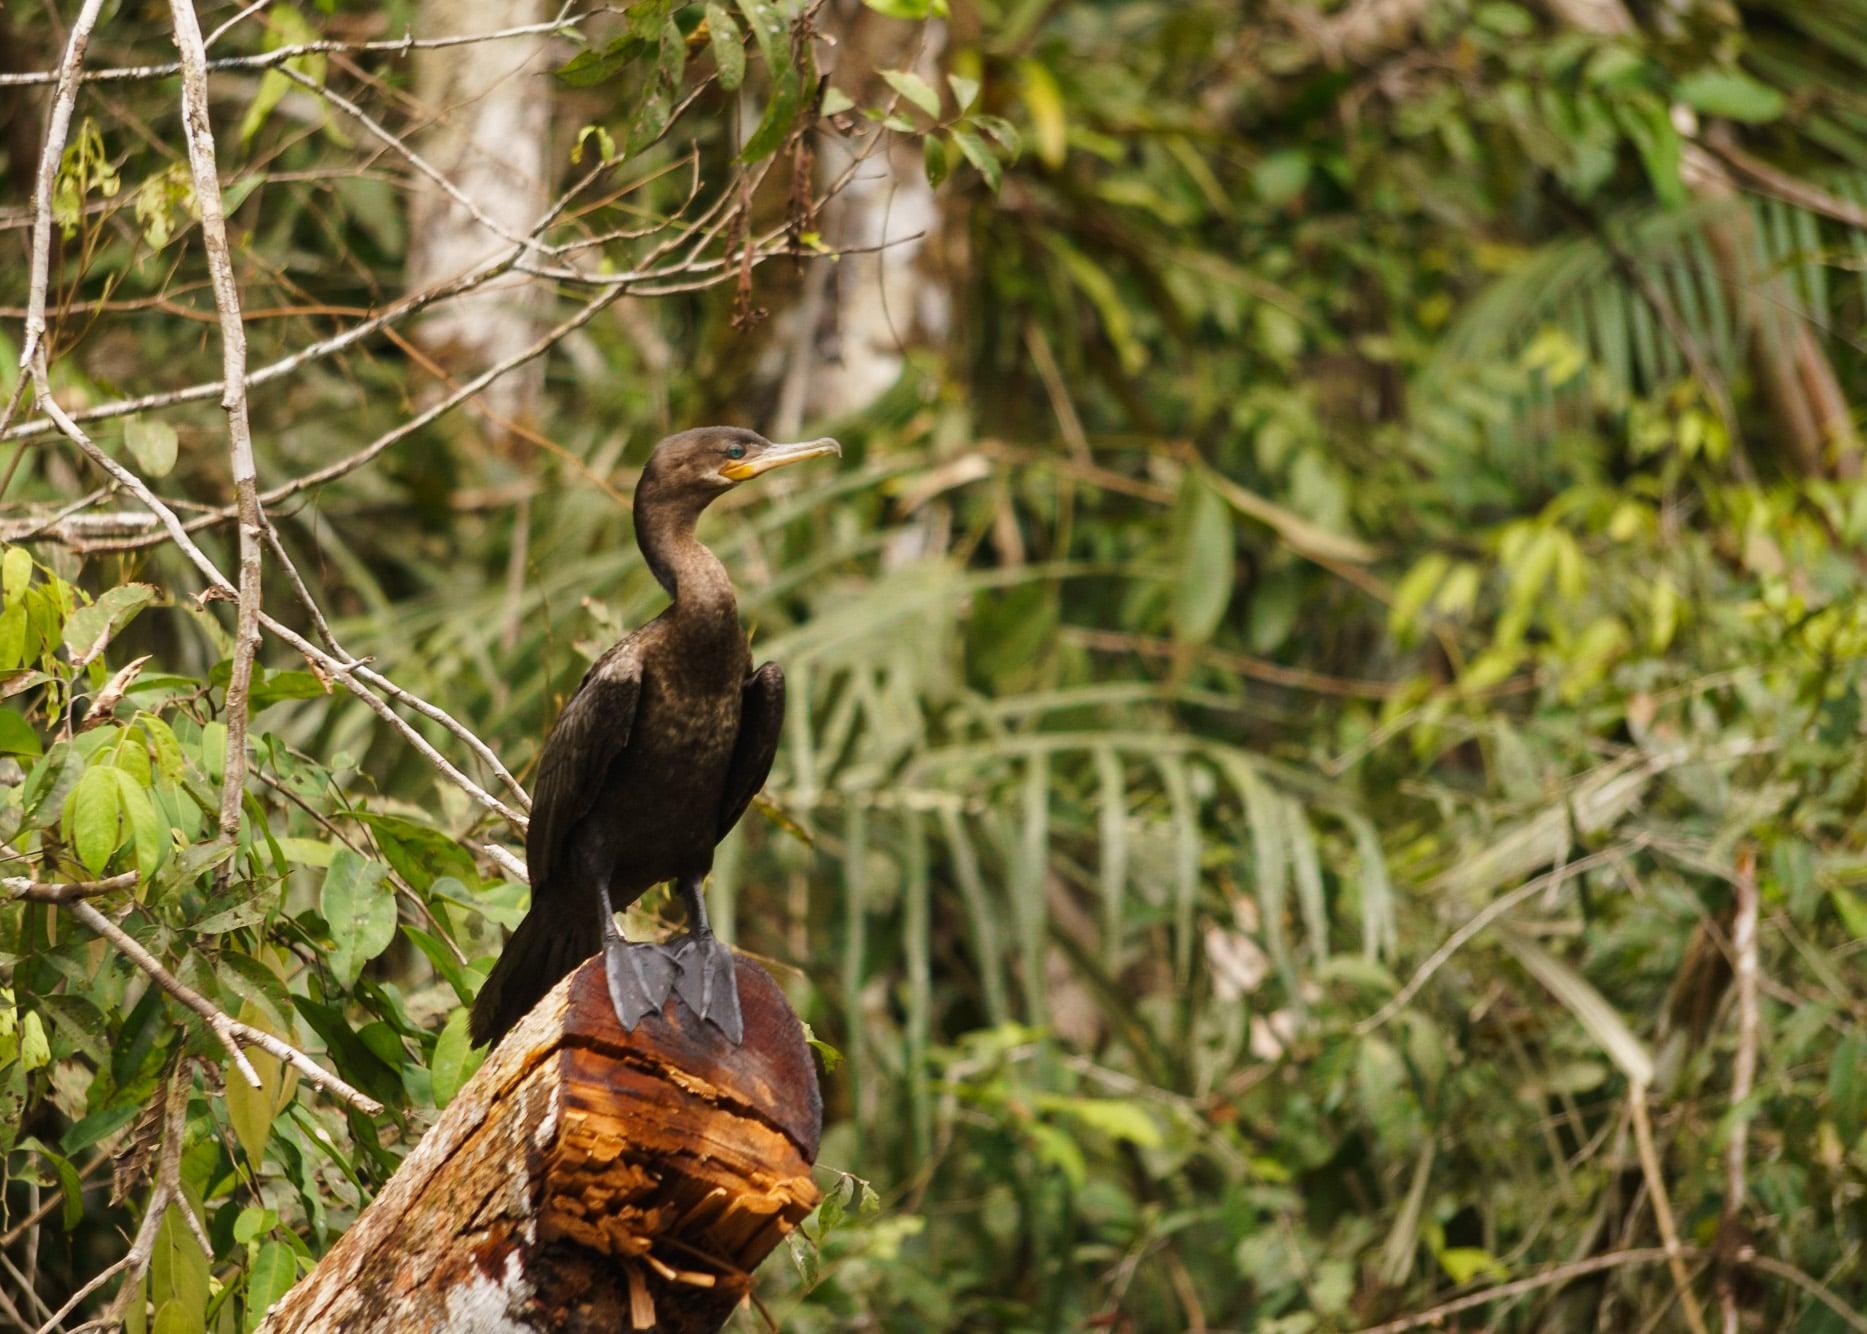 Cormorant posing along the Cuyabeno river bank